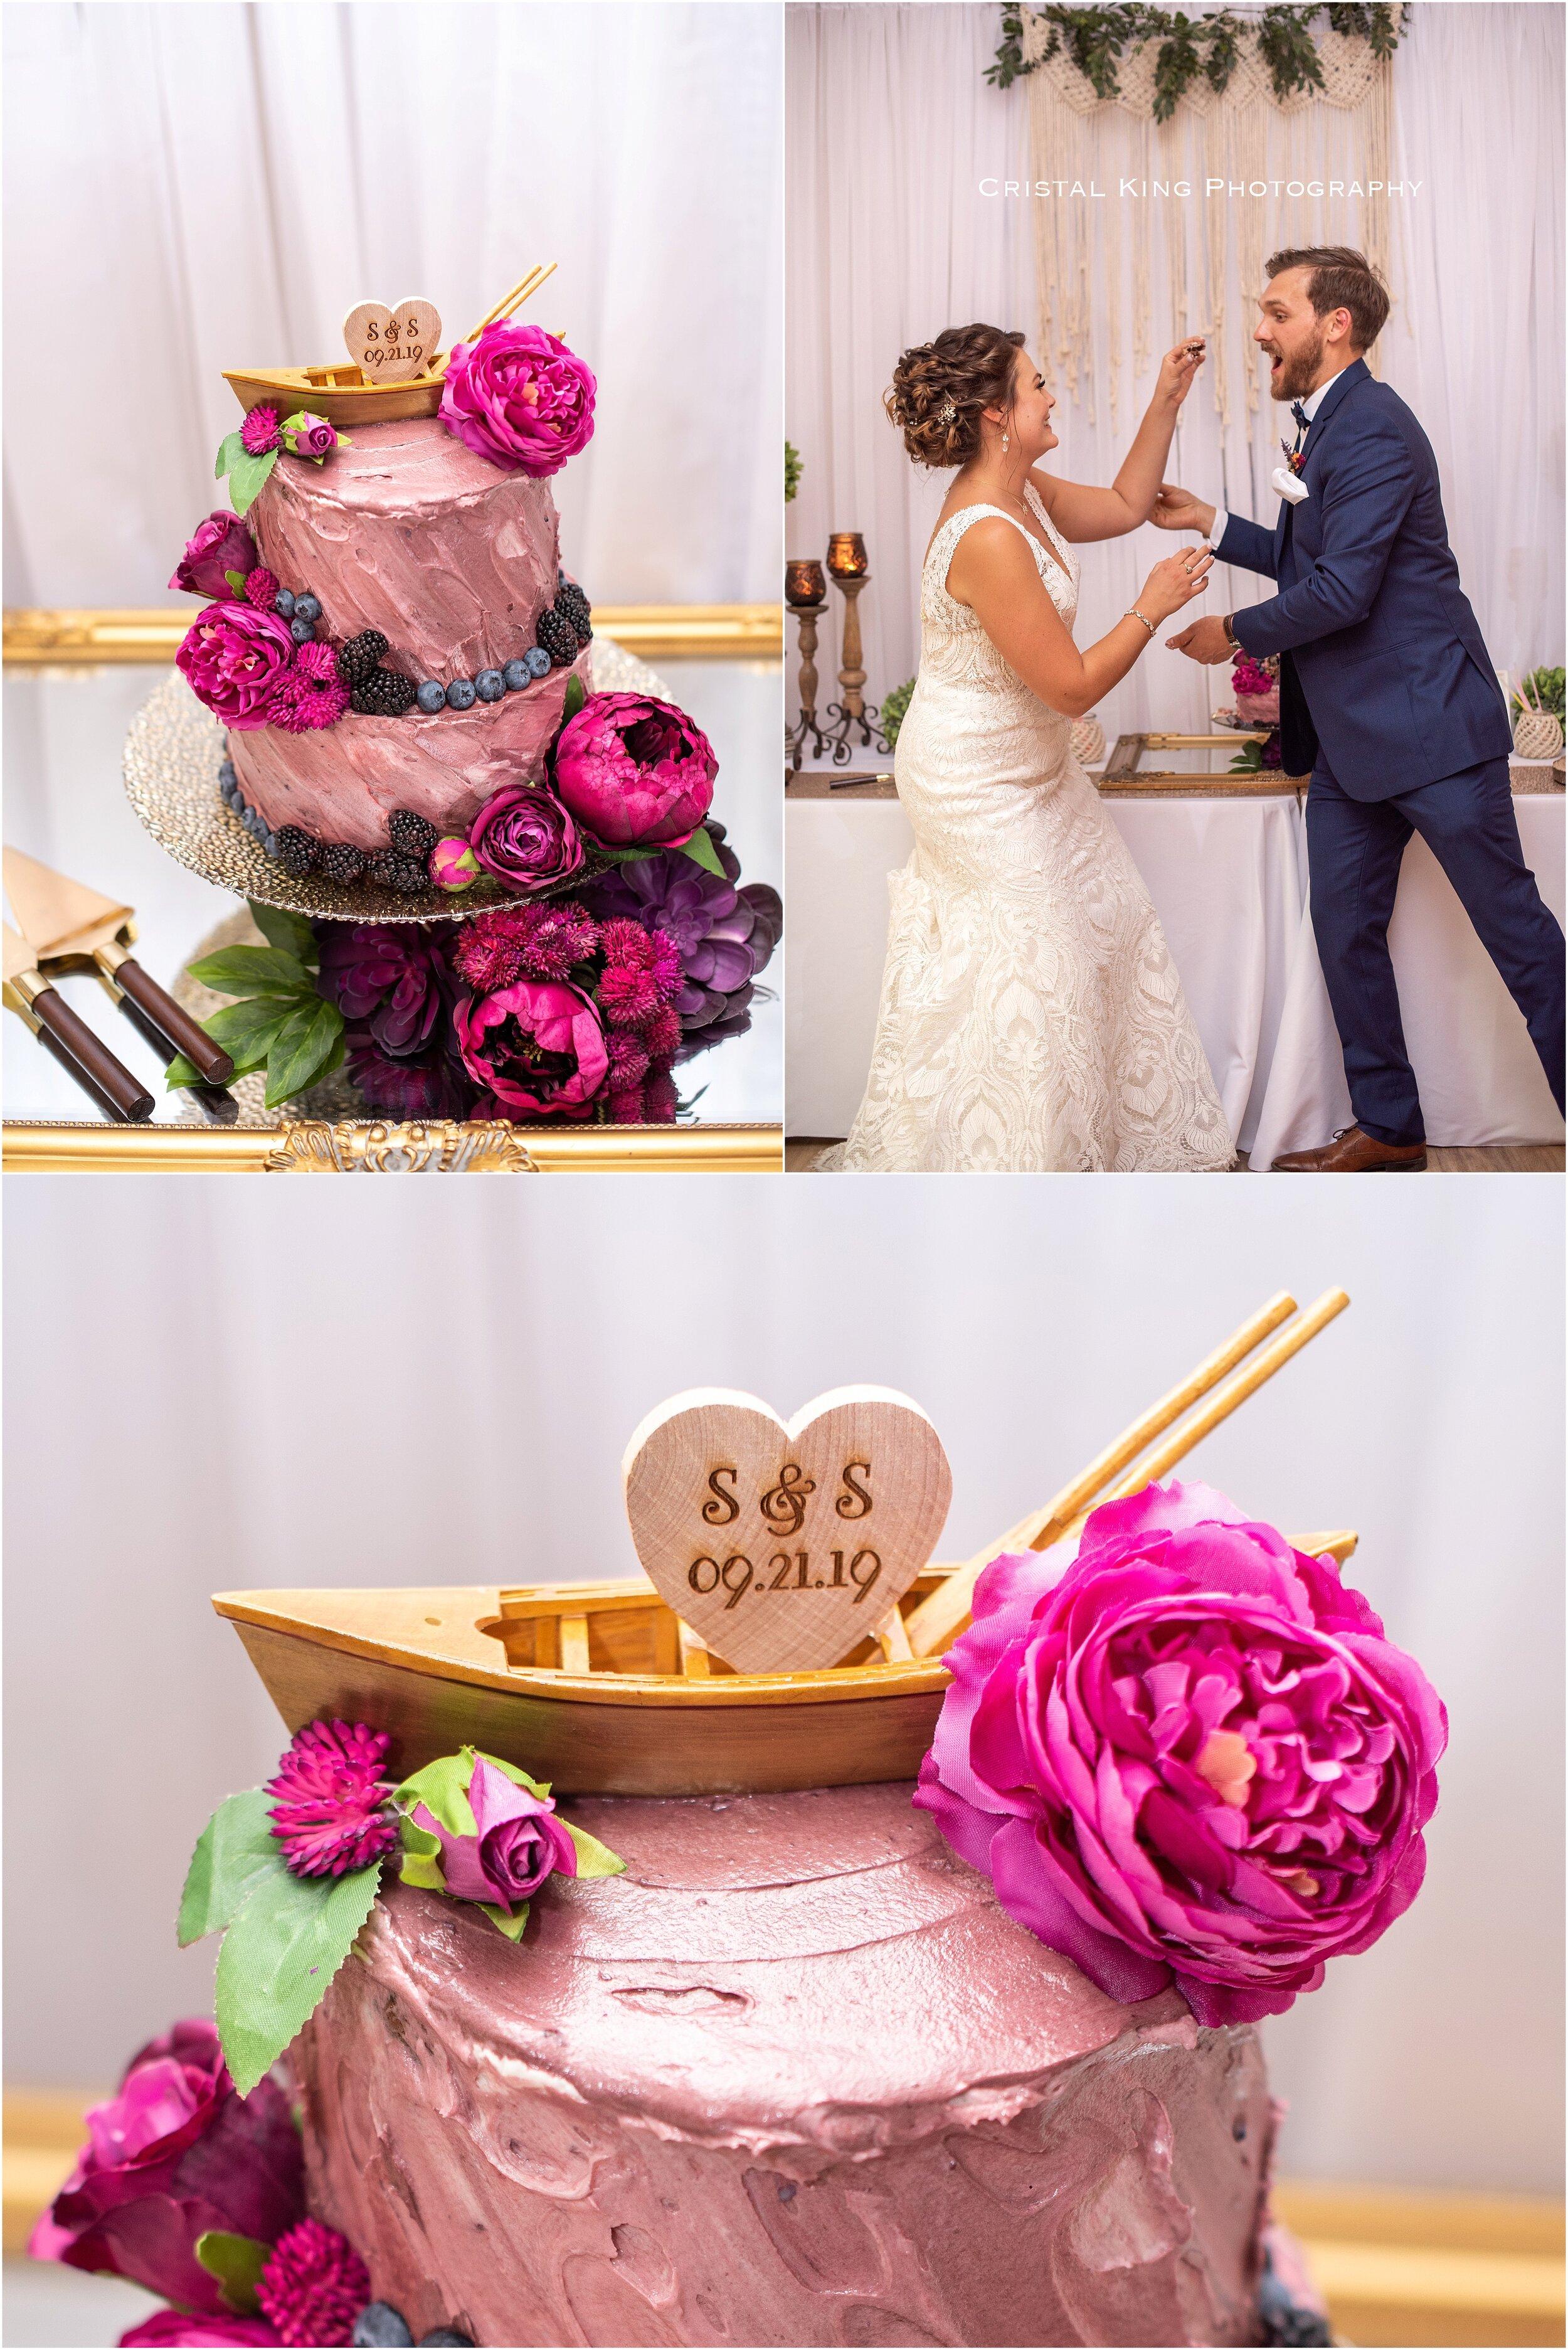 Sarah & Shaun's Wedding-151.jpg